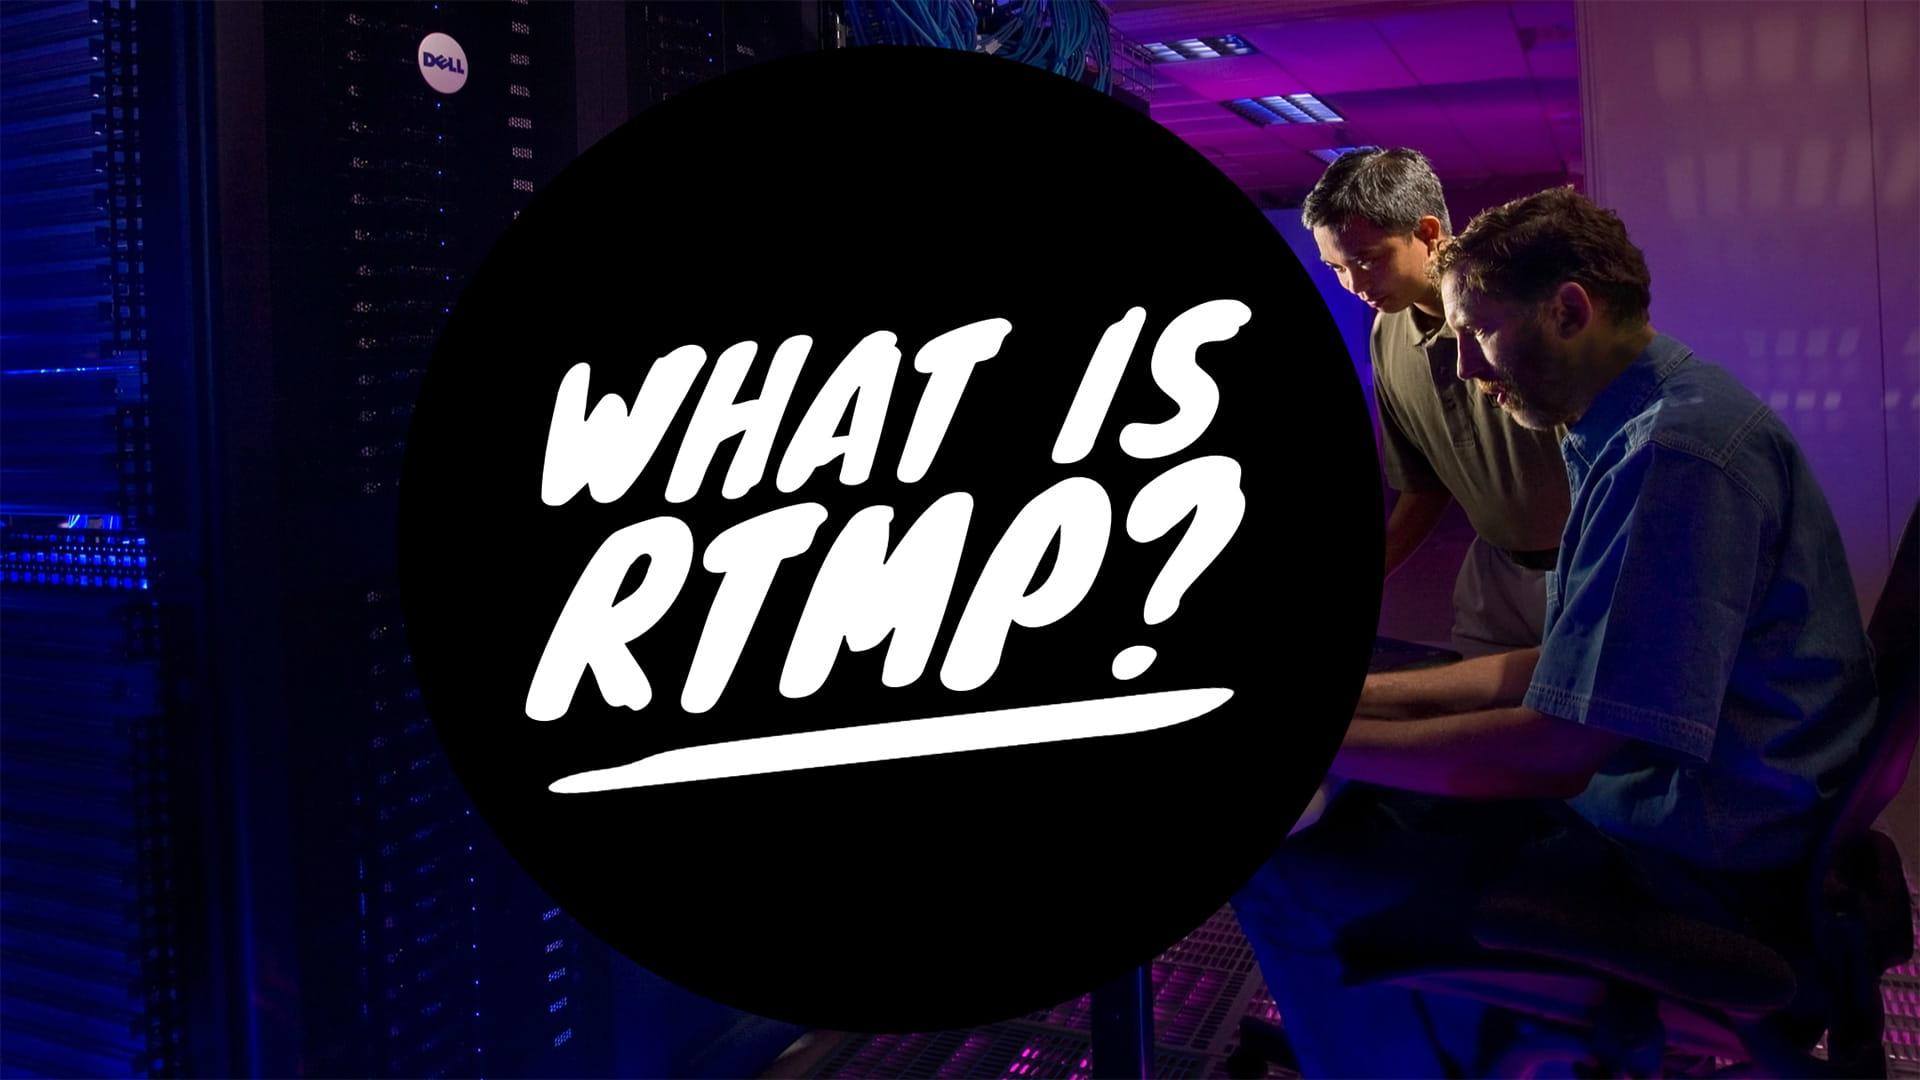 RTMP ストリーミング: The Real-Time Messaging Protocol について解説します [ Wowza Blog 翻訳 ]